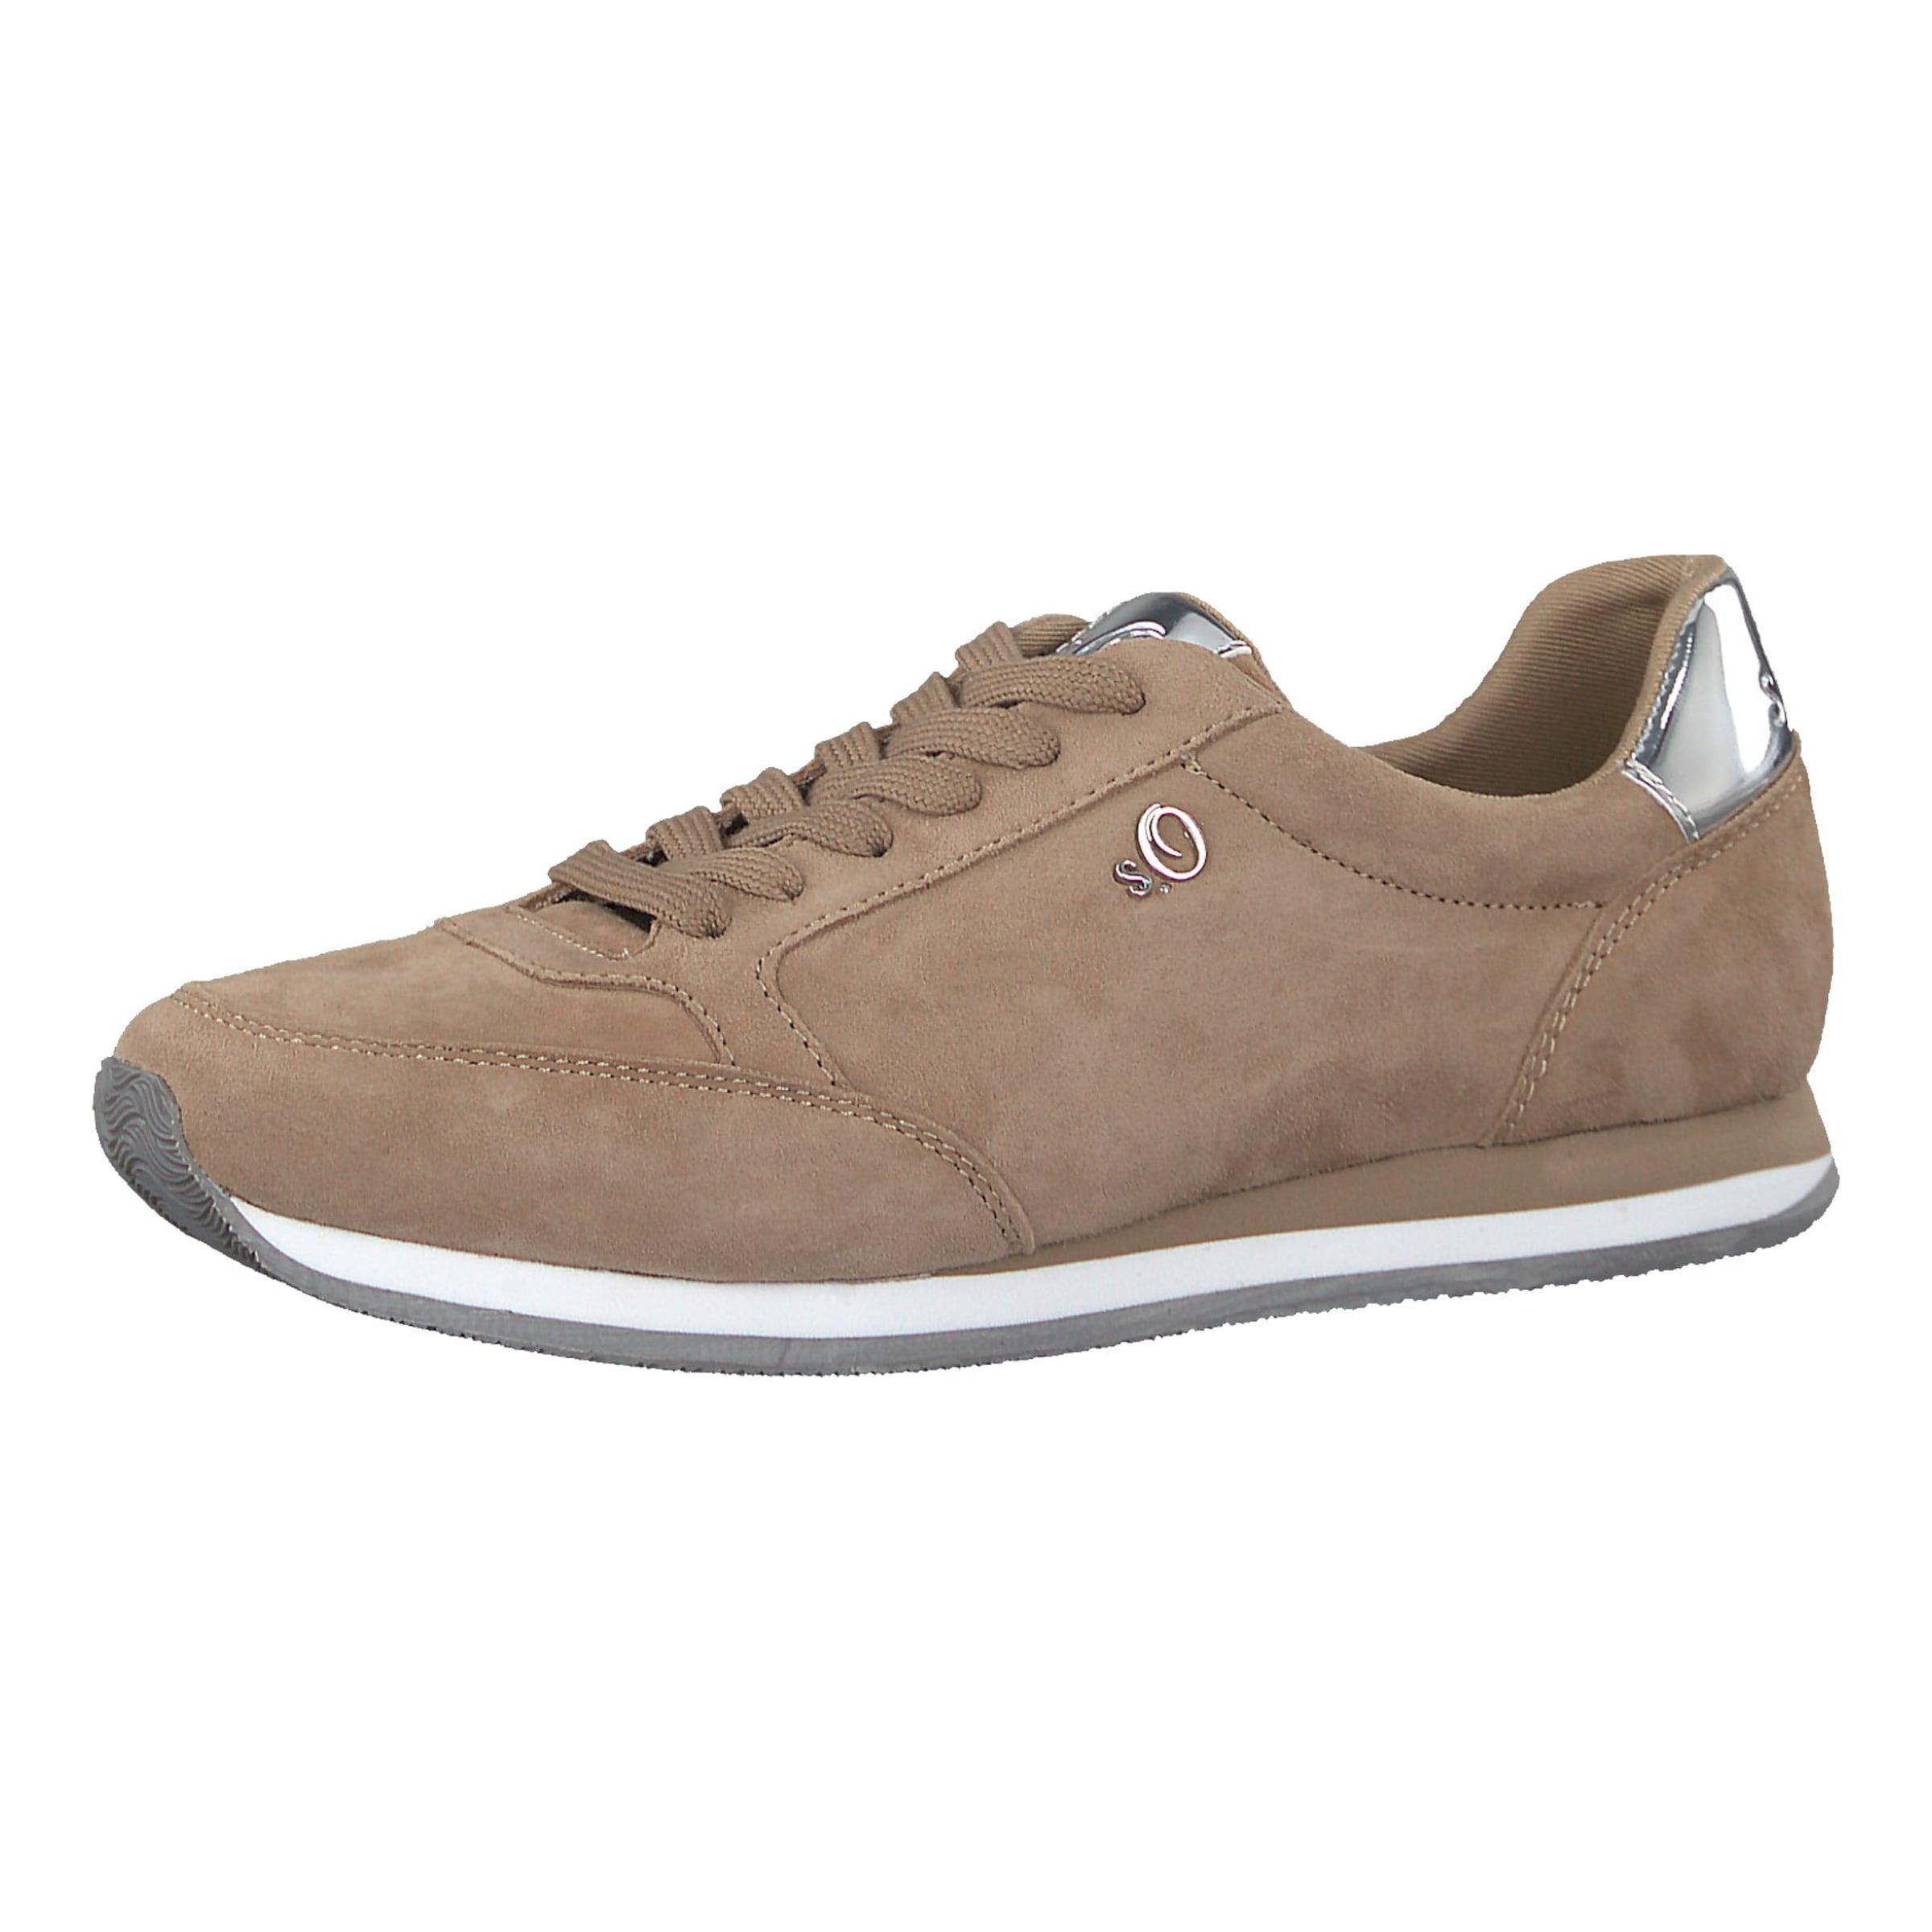 Haltbare Mode billige Schuhe s.Oliver RED LABEL | Sneaker Schuhe Gut getragene Schuhe